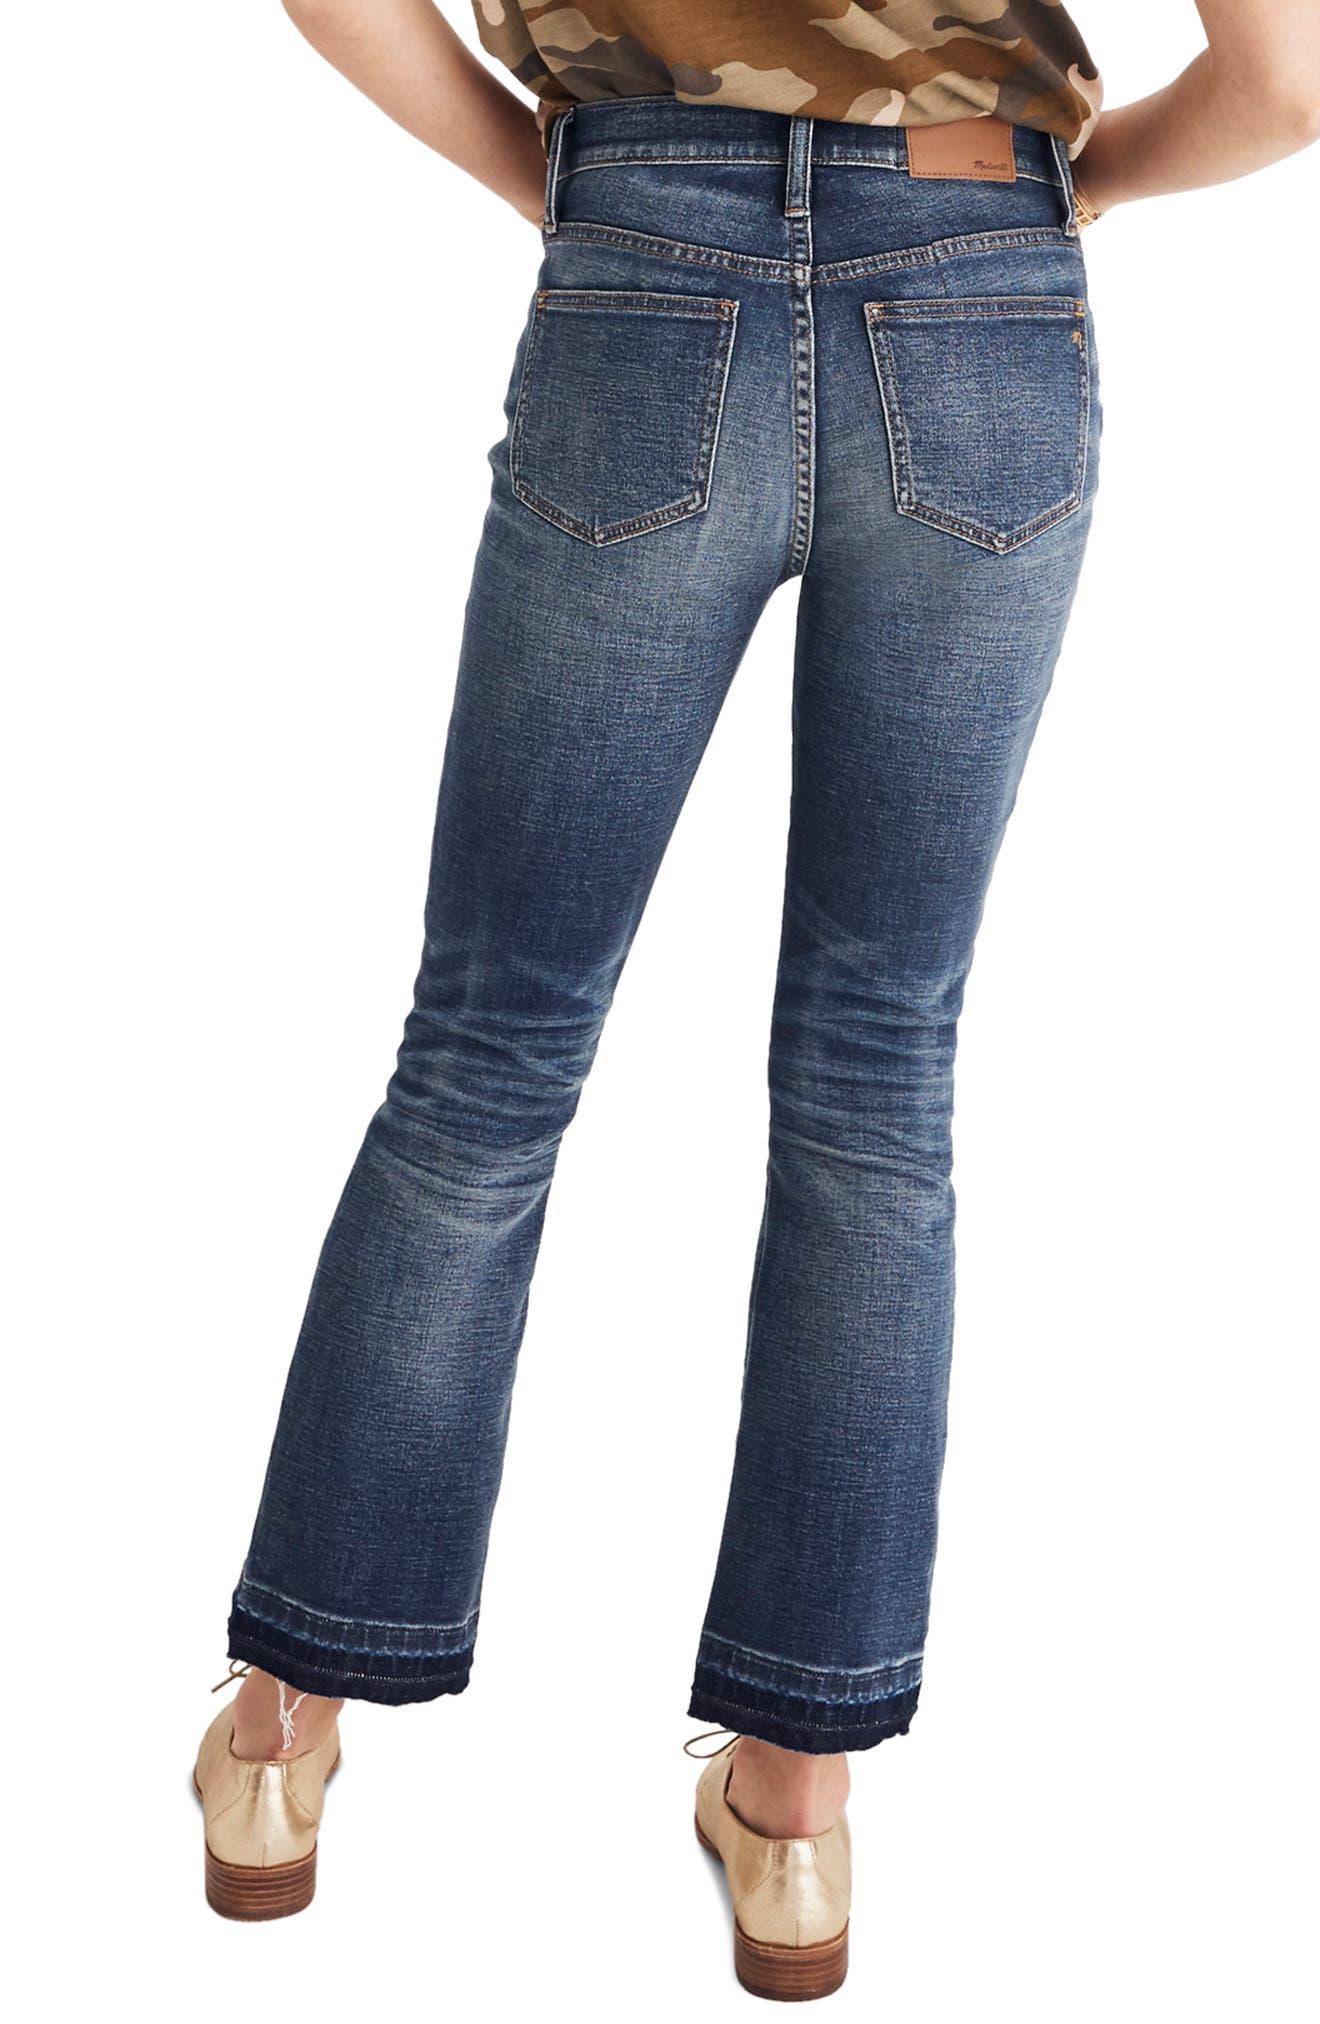 Cali Patch Pocket High Waist Demi Boot Jeans,                             Alternate thumbnail 2, color,                             DERMOTT